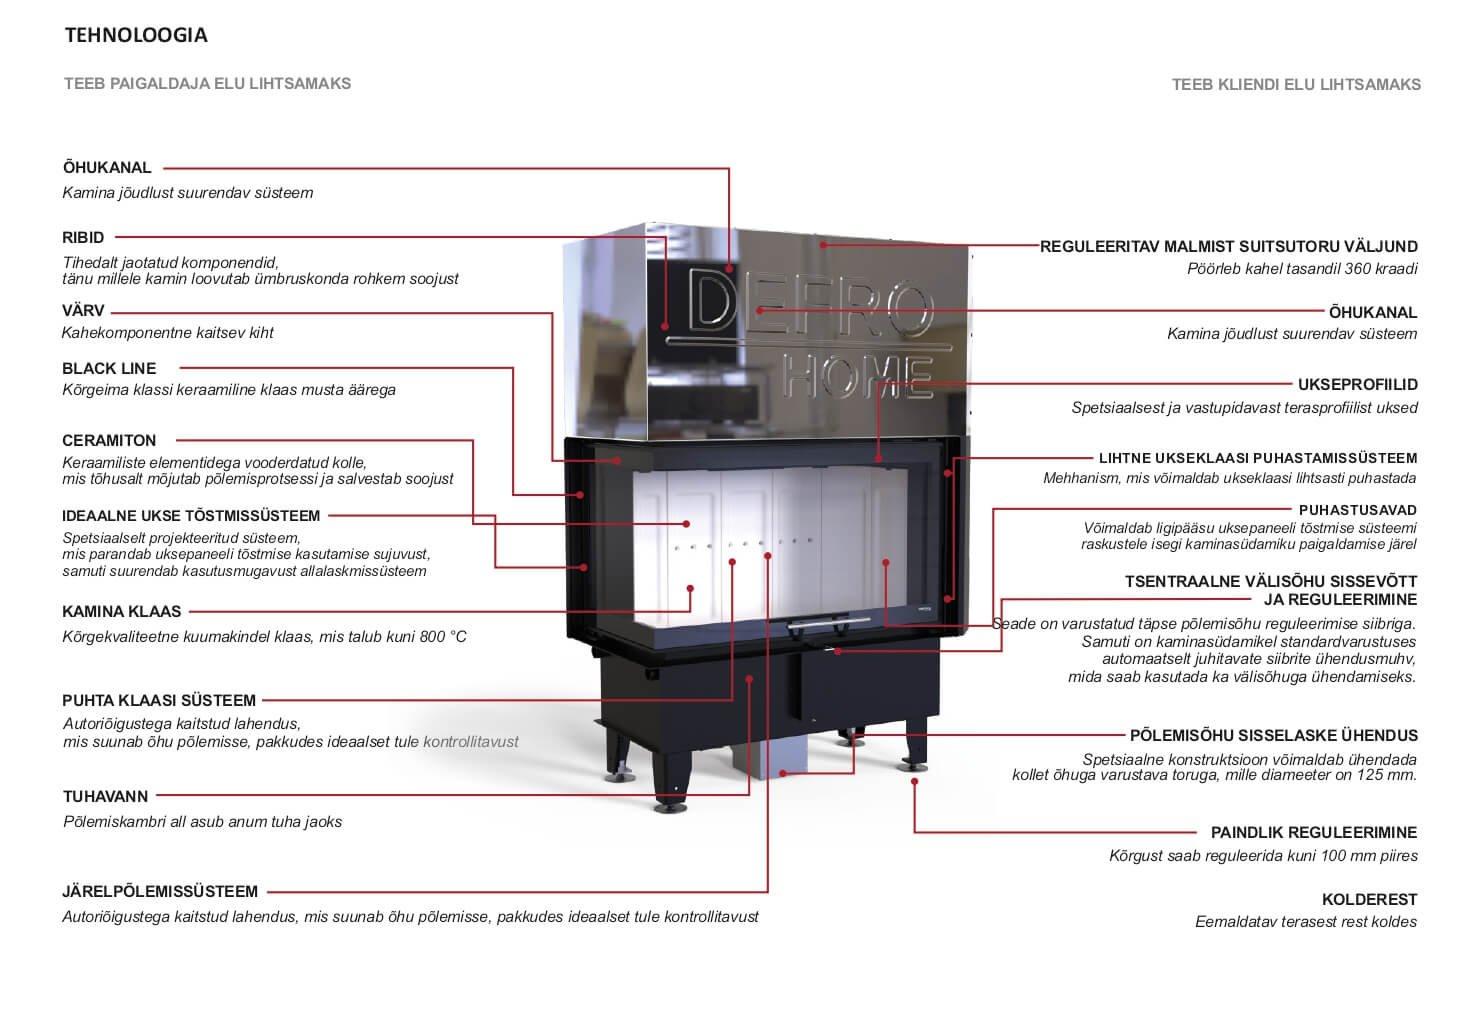 Defro Home Kaminasüdamik Intra BL G tehnoloogia